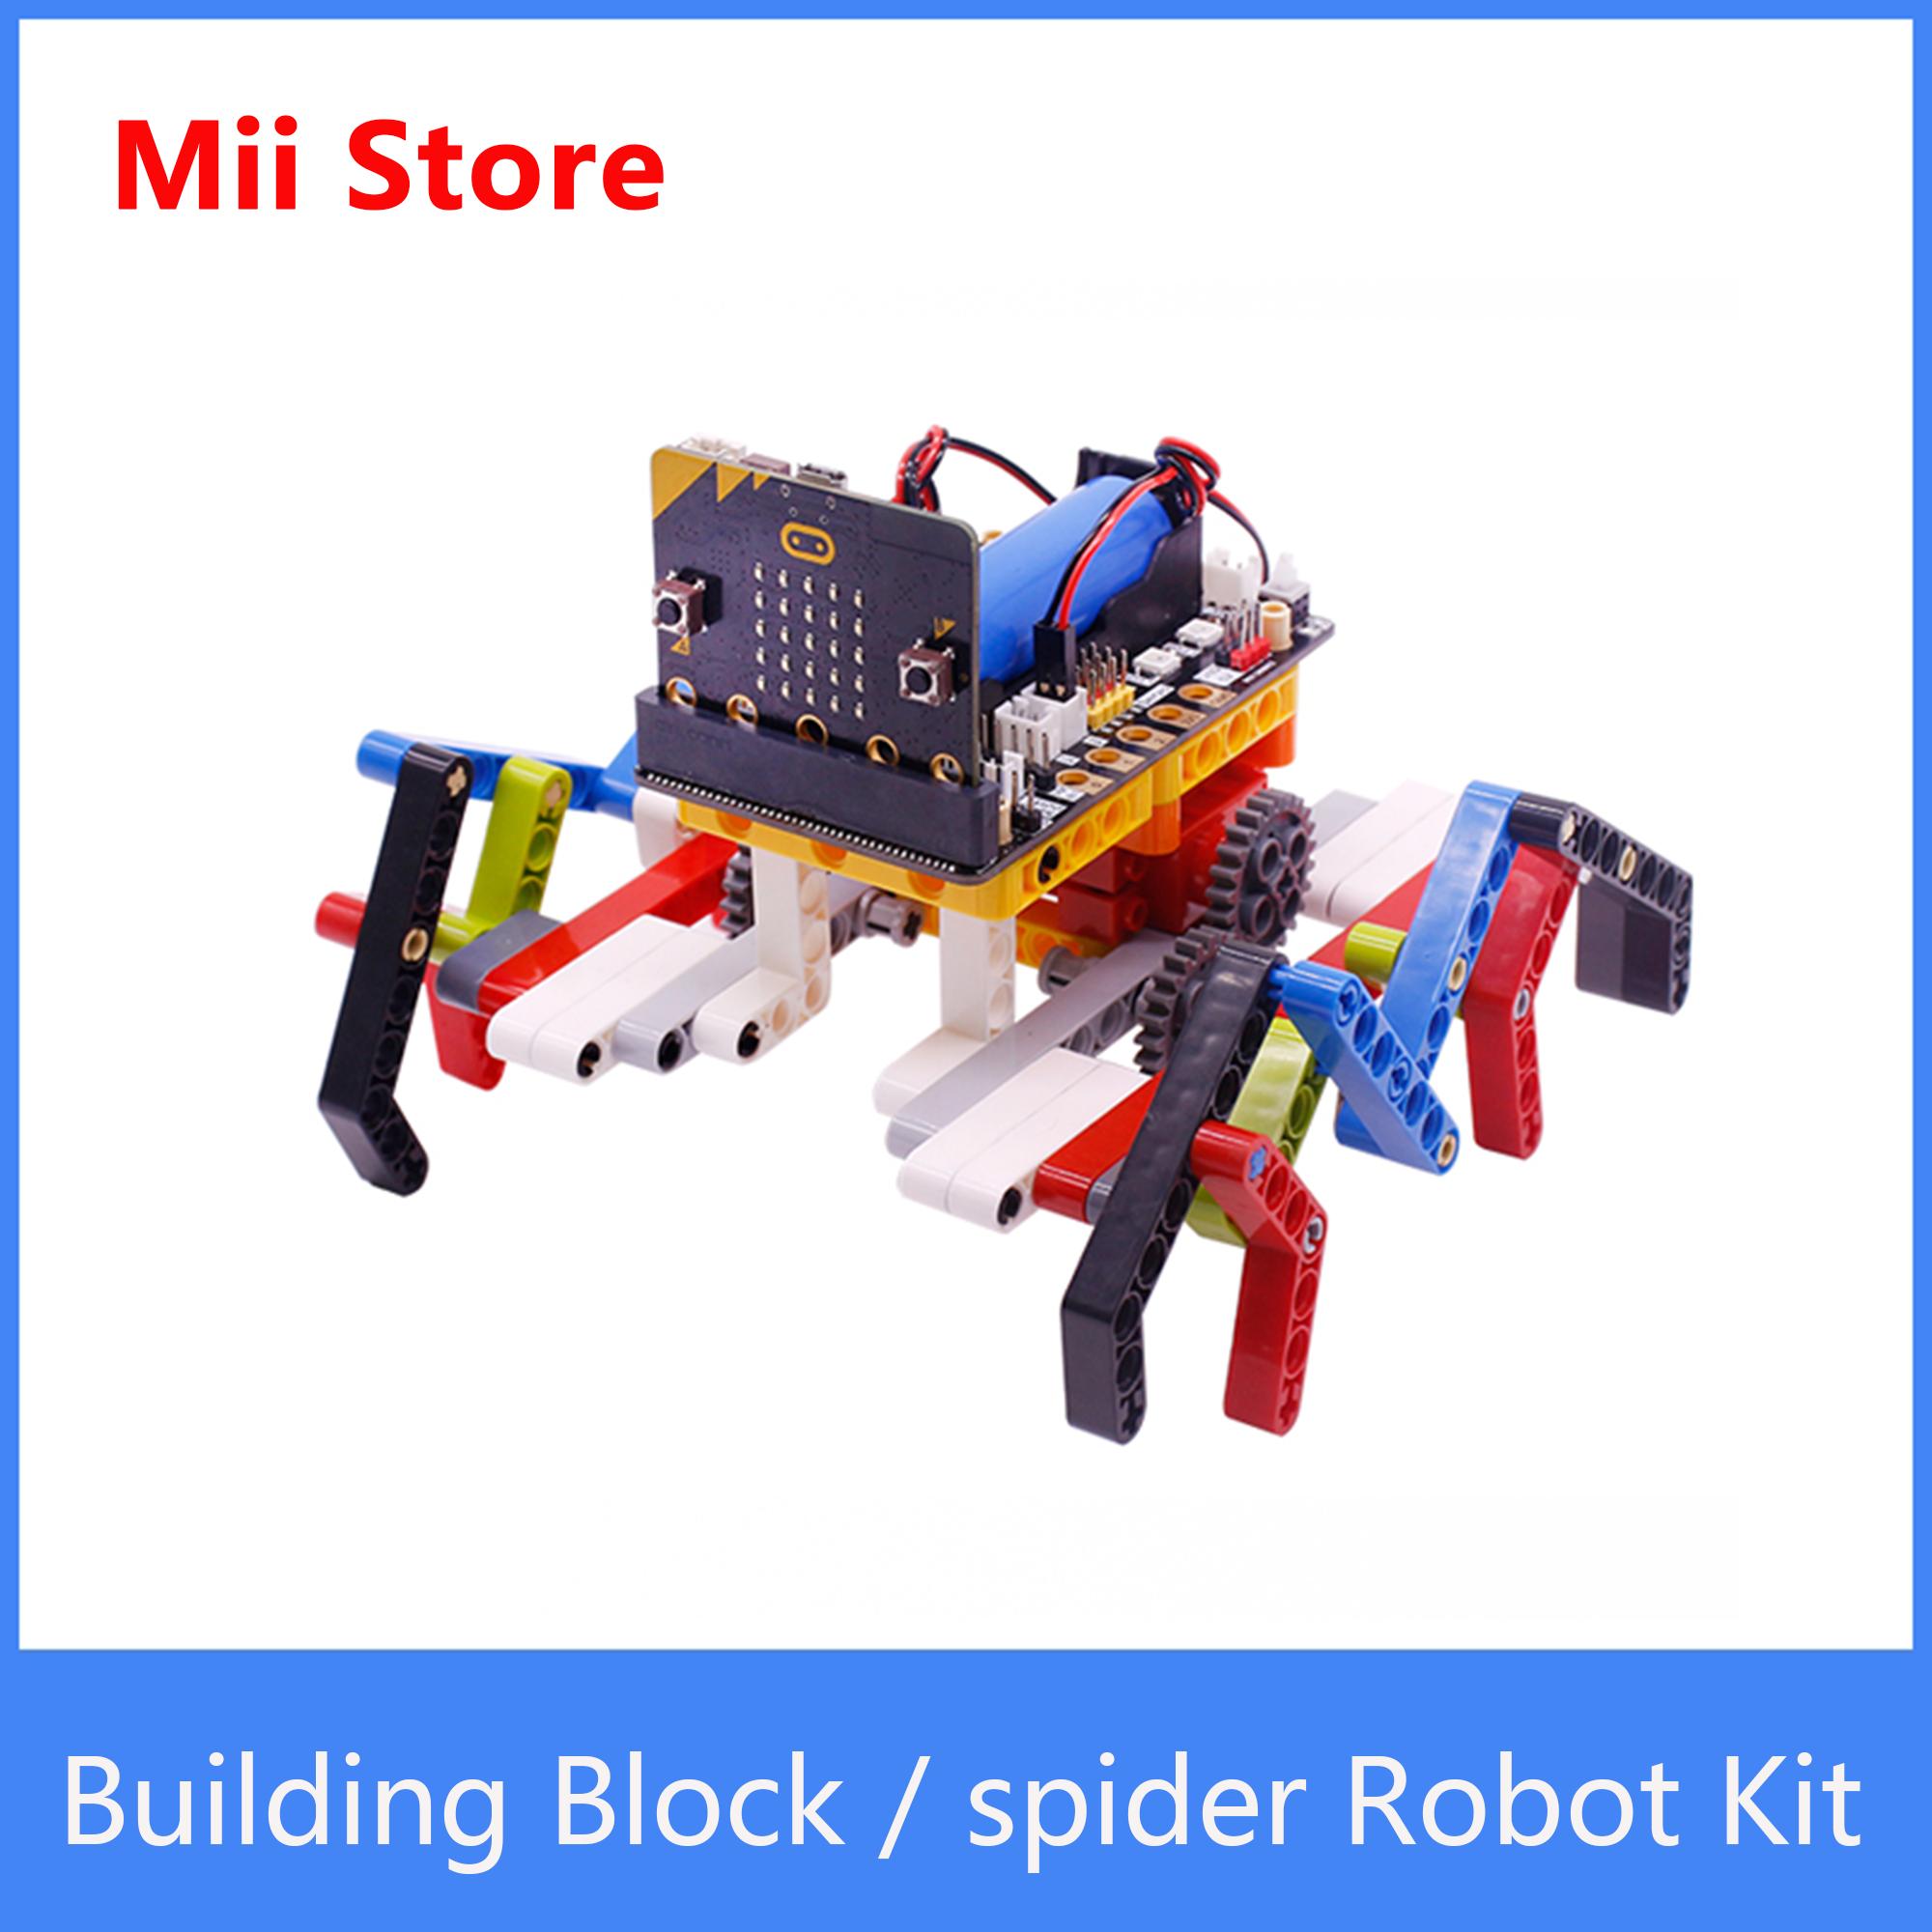 Yahboom بنة مايكرو: بت V2 الجذعية لتقوم بها بنفسك Hexapod روبوت العنكبوت روبوت عدة